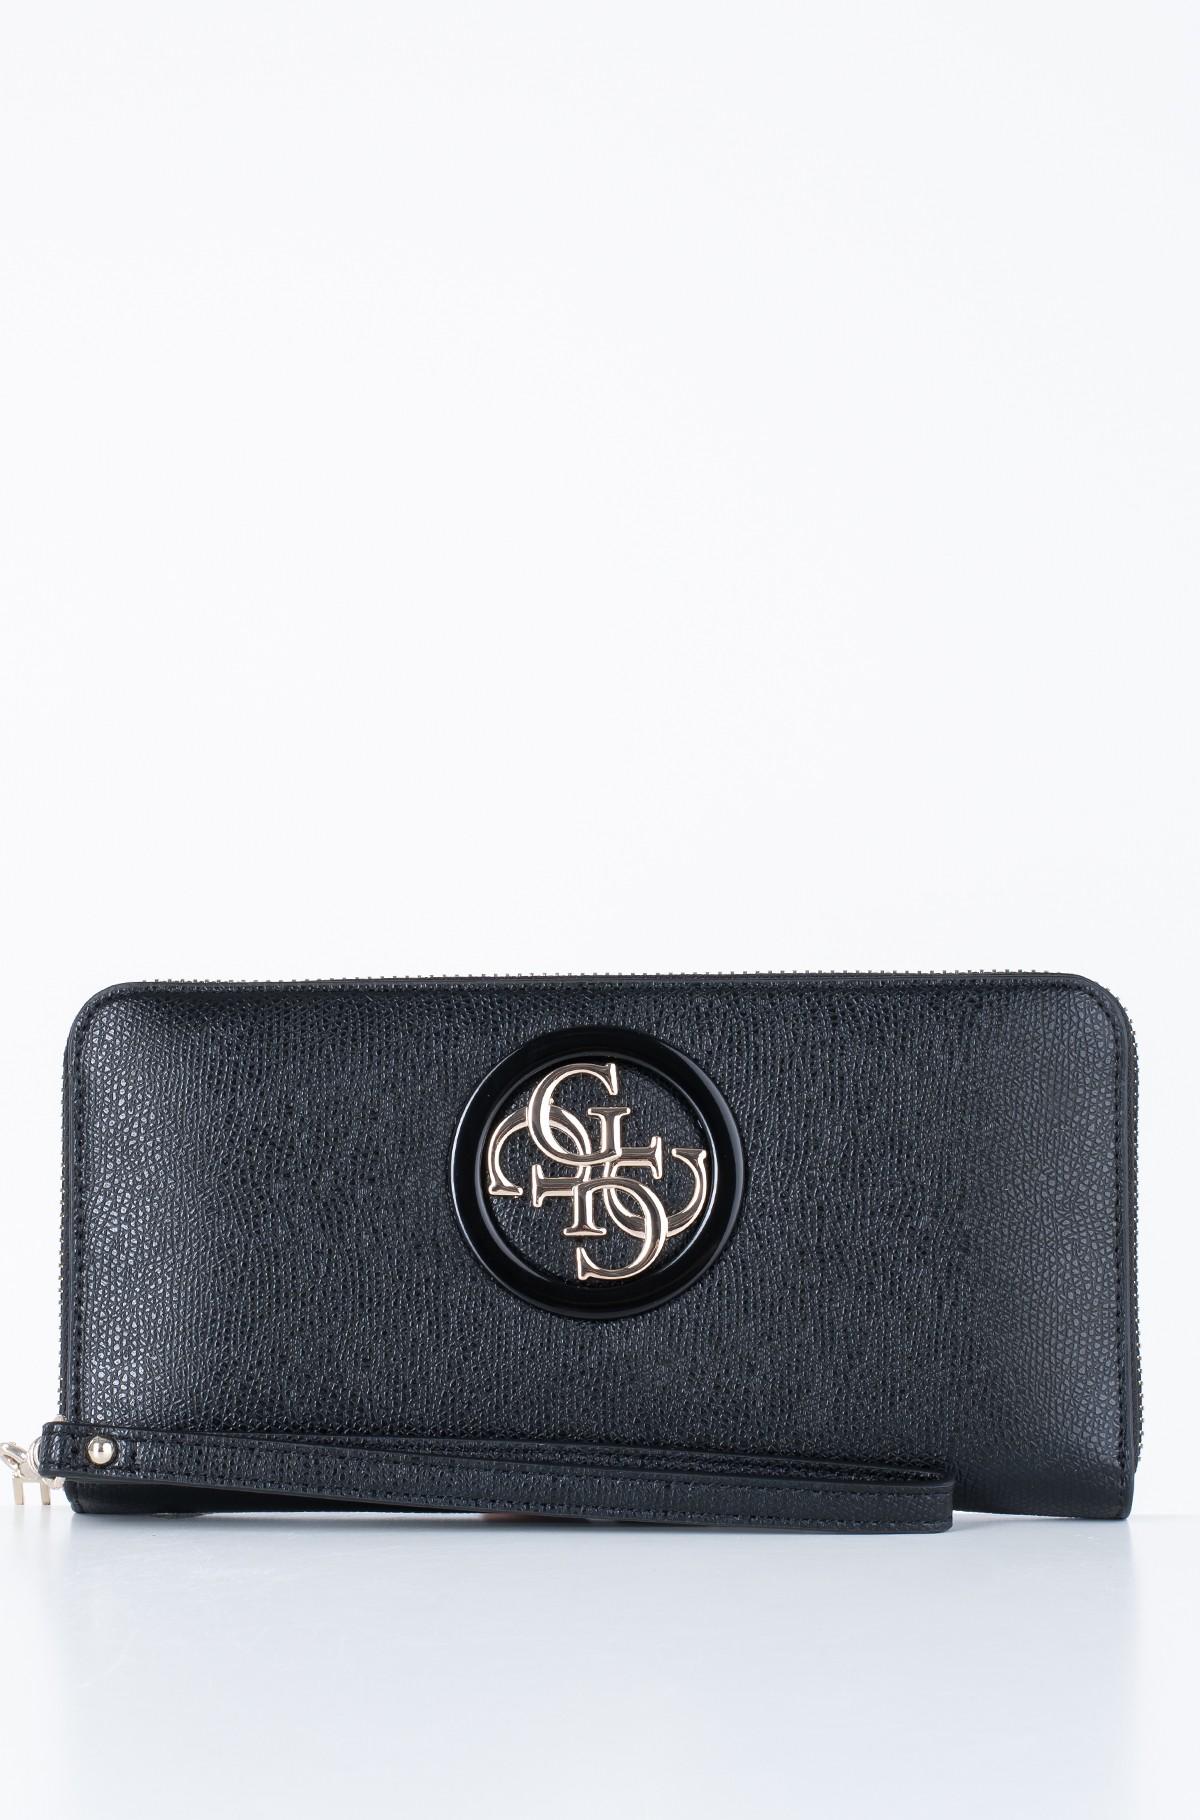 Wallet SWVG71 86460-full-1